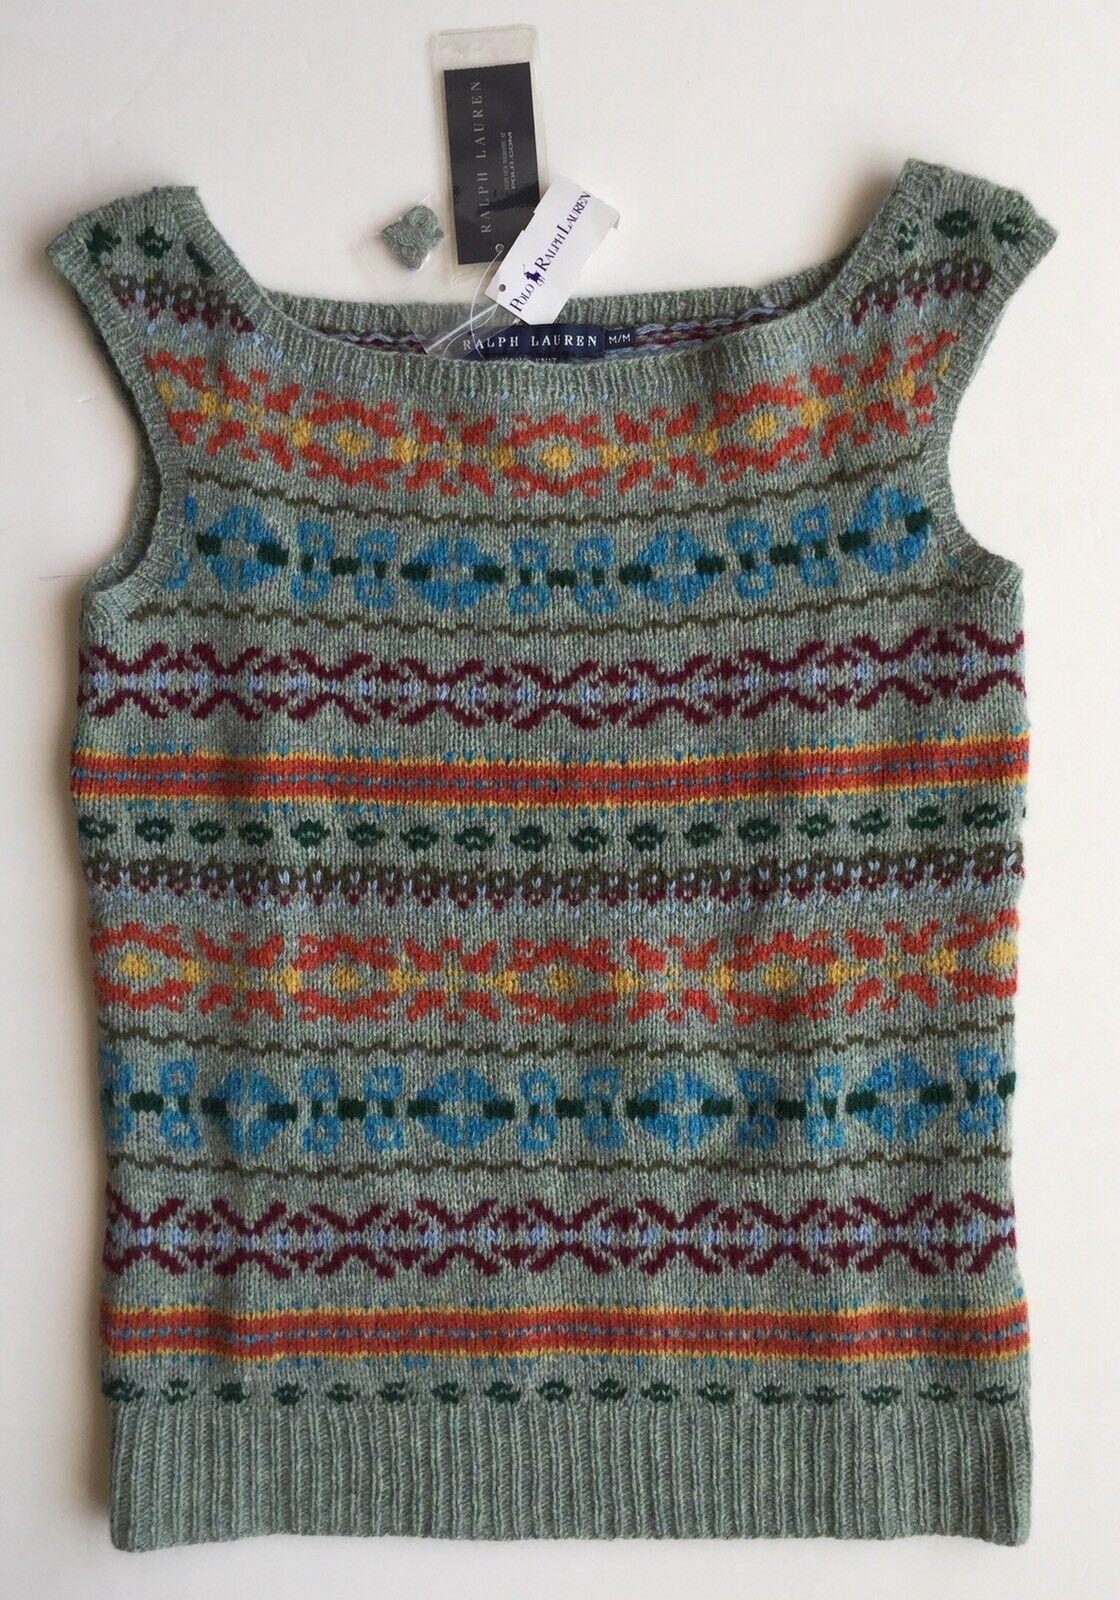 NWT Polo Ralph Lauren hand knit pattern wool cashmere sweater top vest medium m